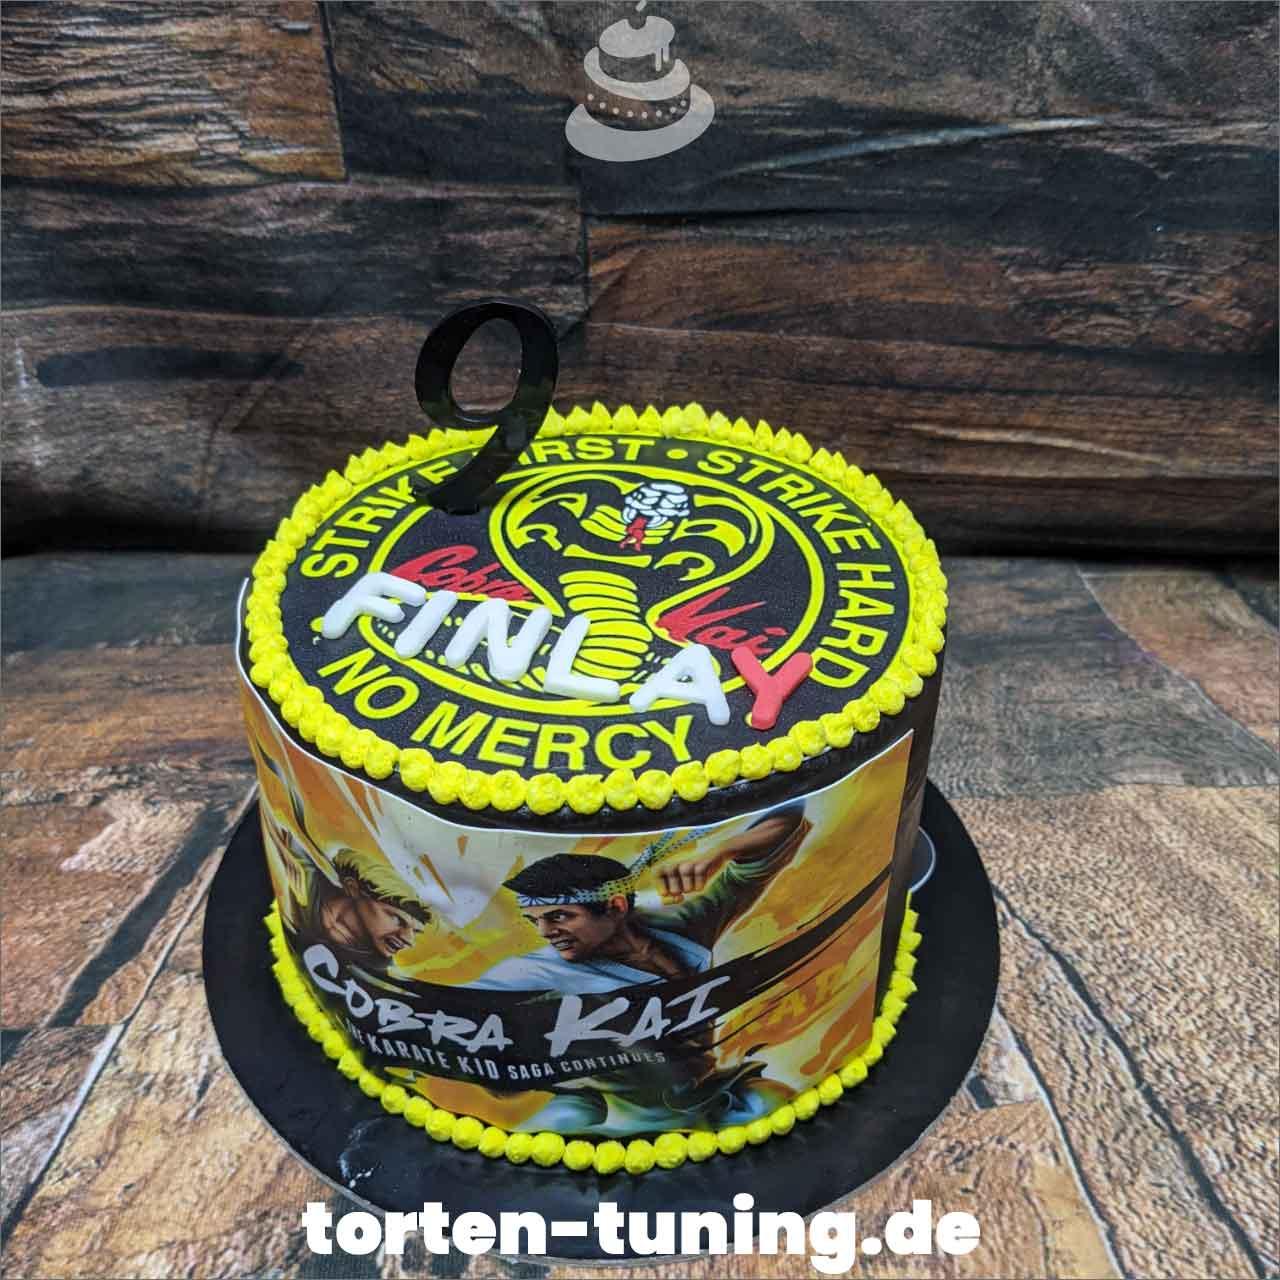 Cobra Kai Dripcake Obsttorte Geburtstagstorte Motivtorte Torte Tortendekoration Torte online bestellen Suhl Thüringen Torten Tuning Sahnetorte Tortenfiguren Cake Topper